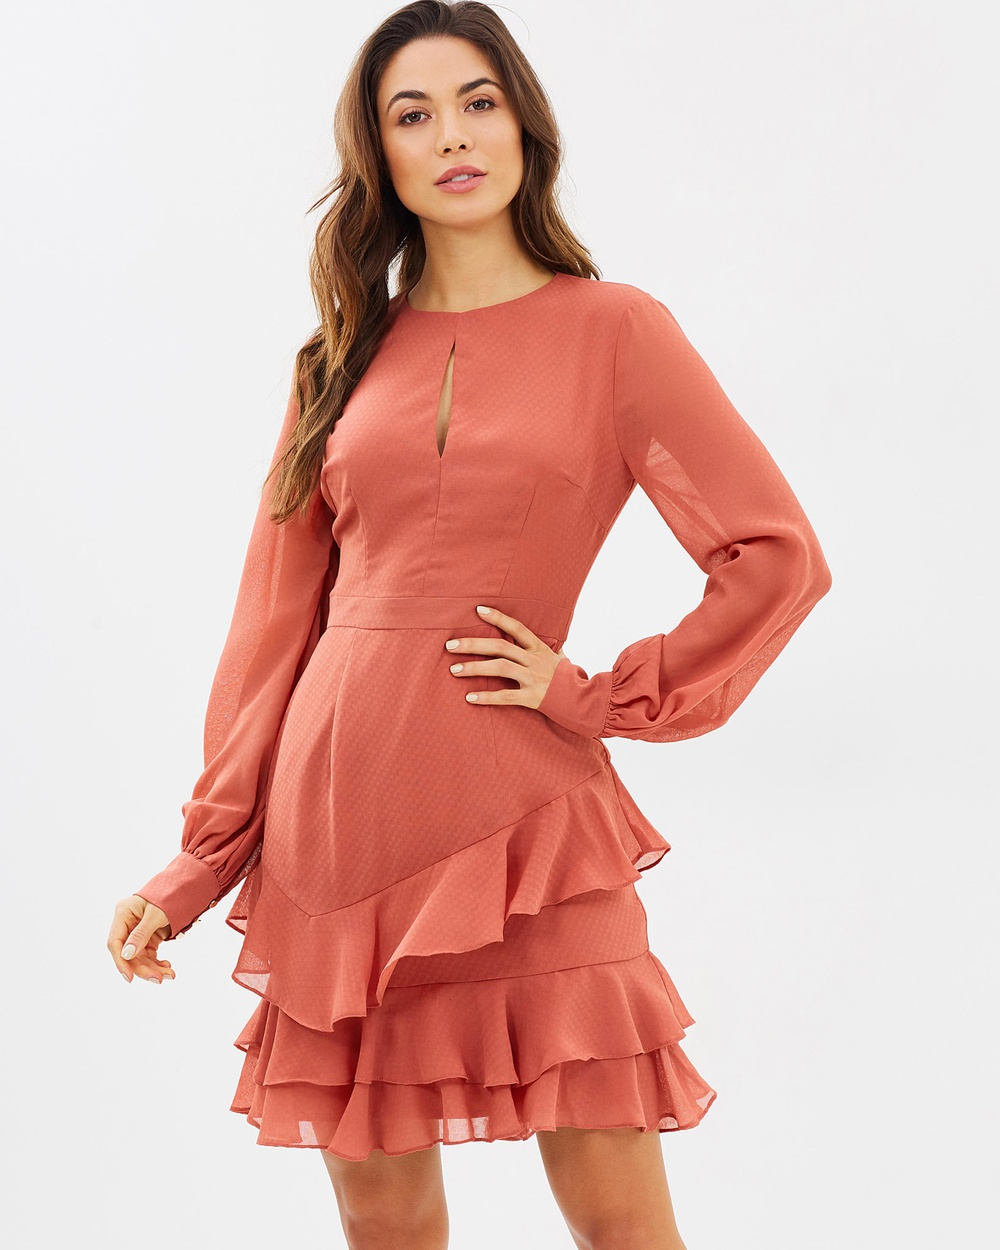 Cooper St Briar Rose Long Sleeve Dress Dresses Cinnamon Red Briar Rose Long Sleeve Dress